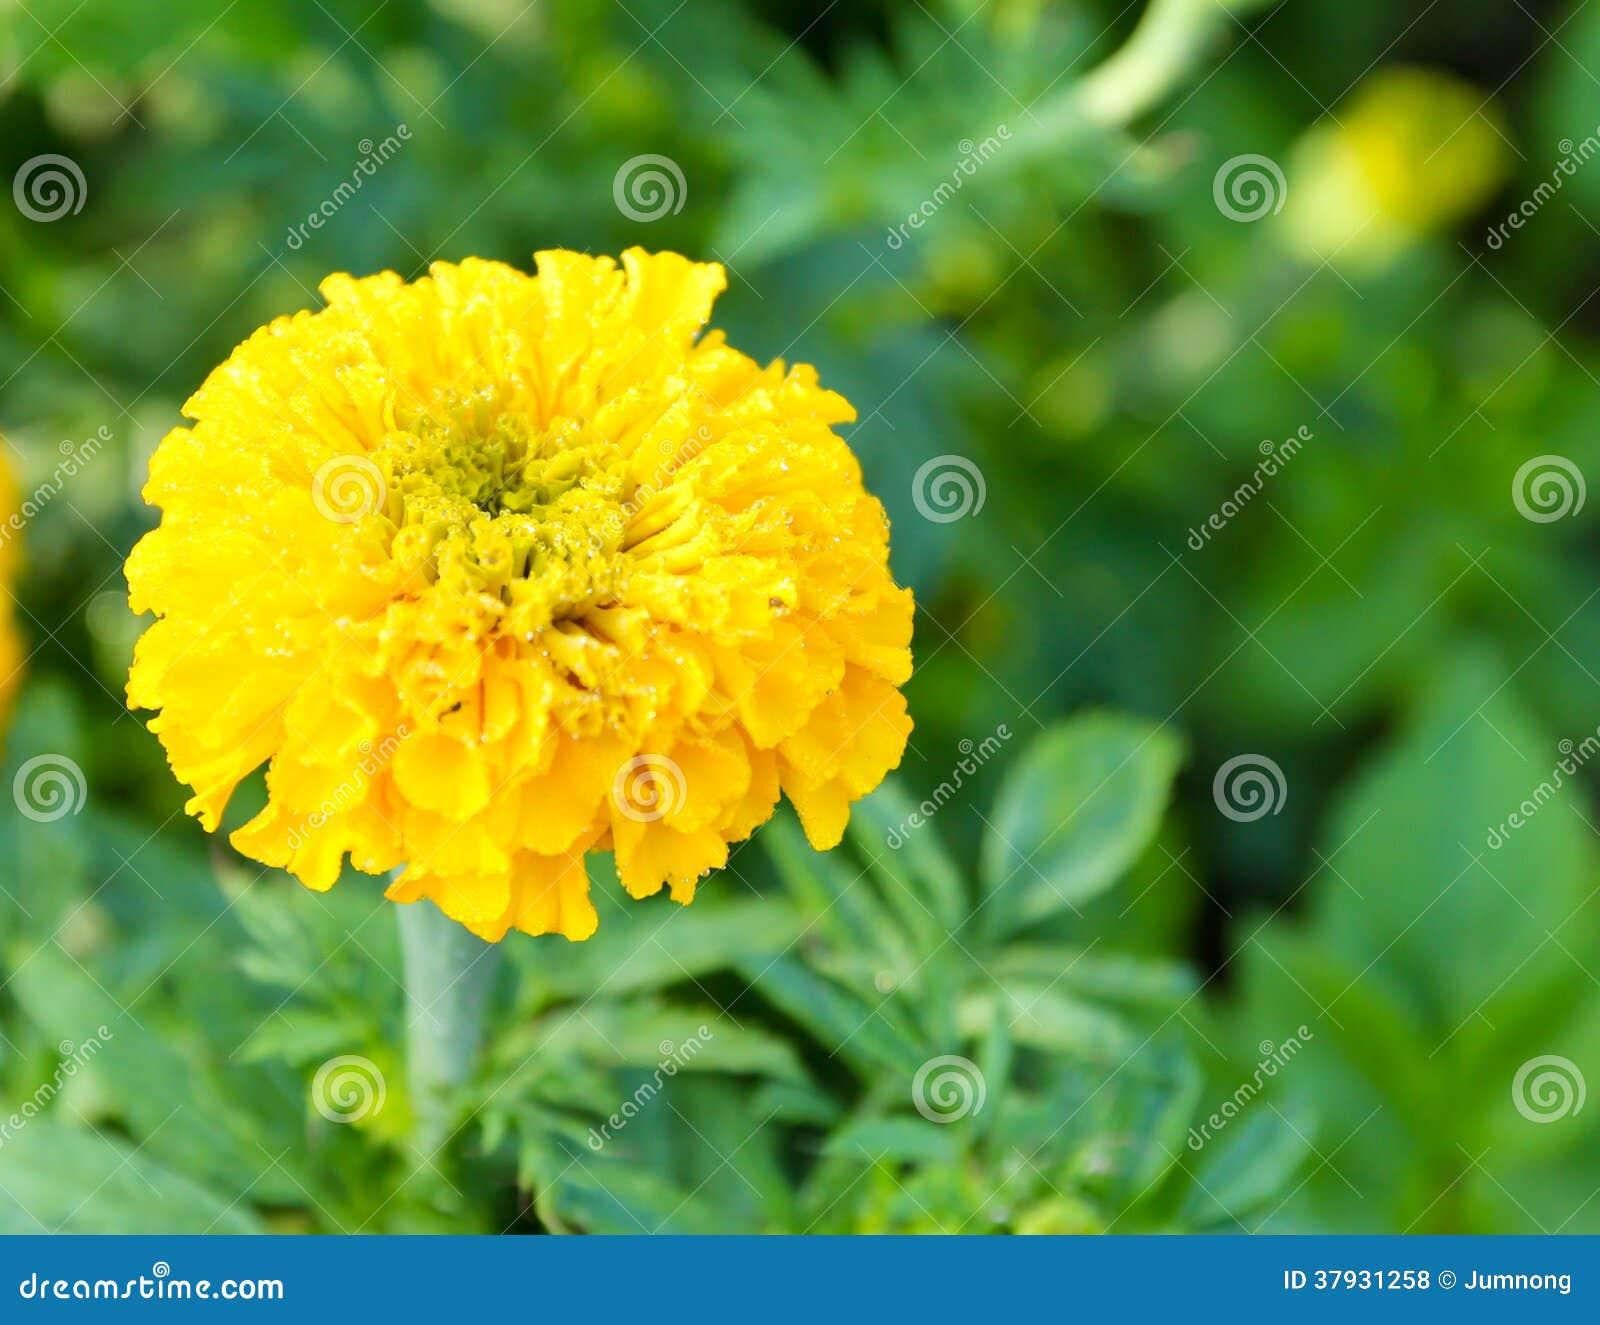 Maravilla en la granja de la flor